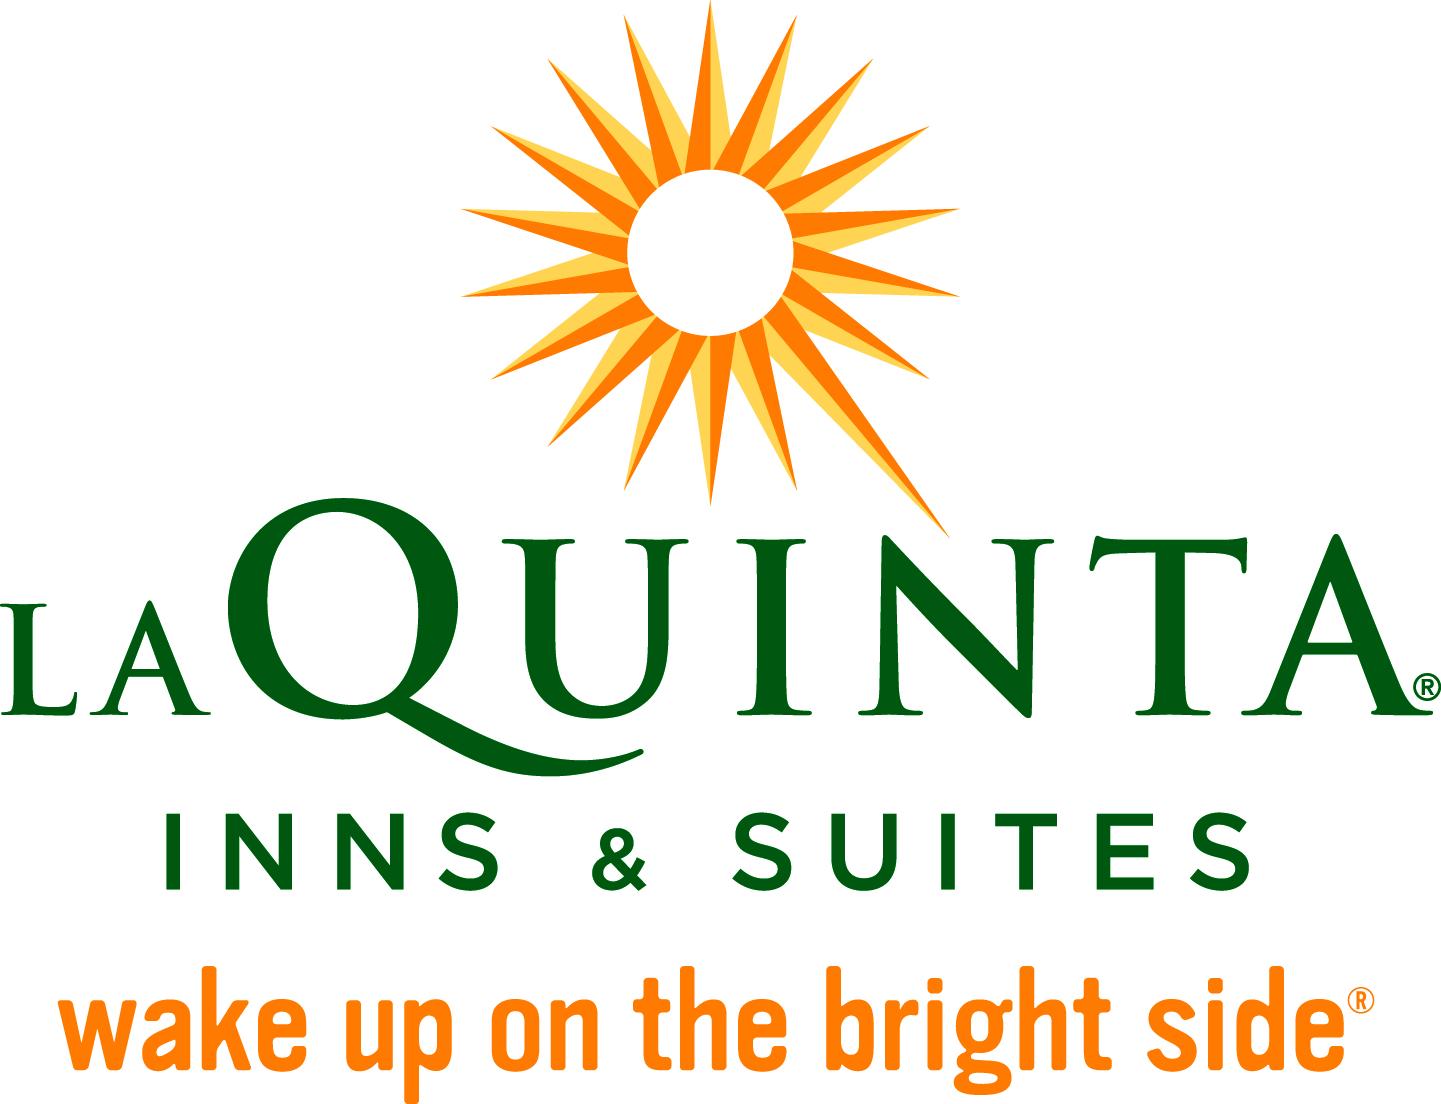 La Quinta Inns and Suites